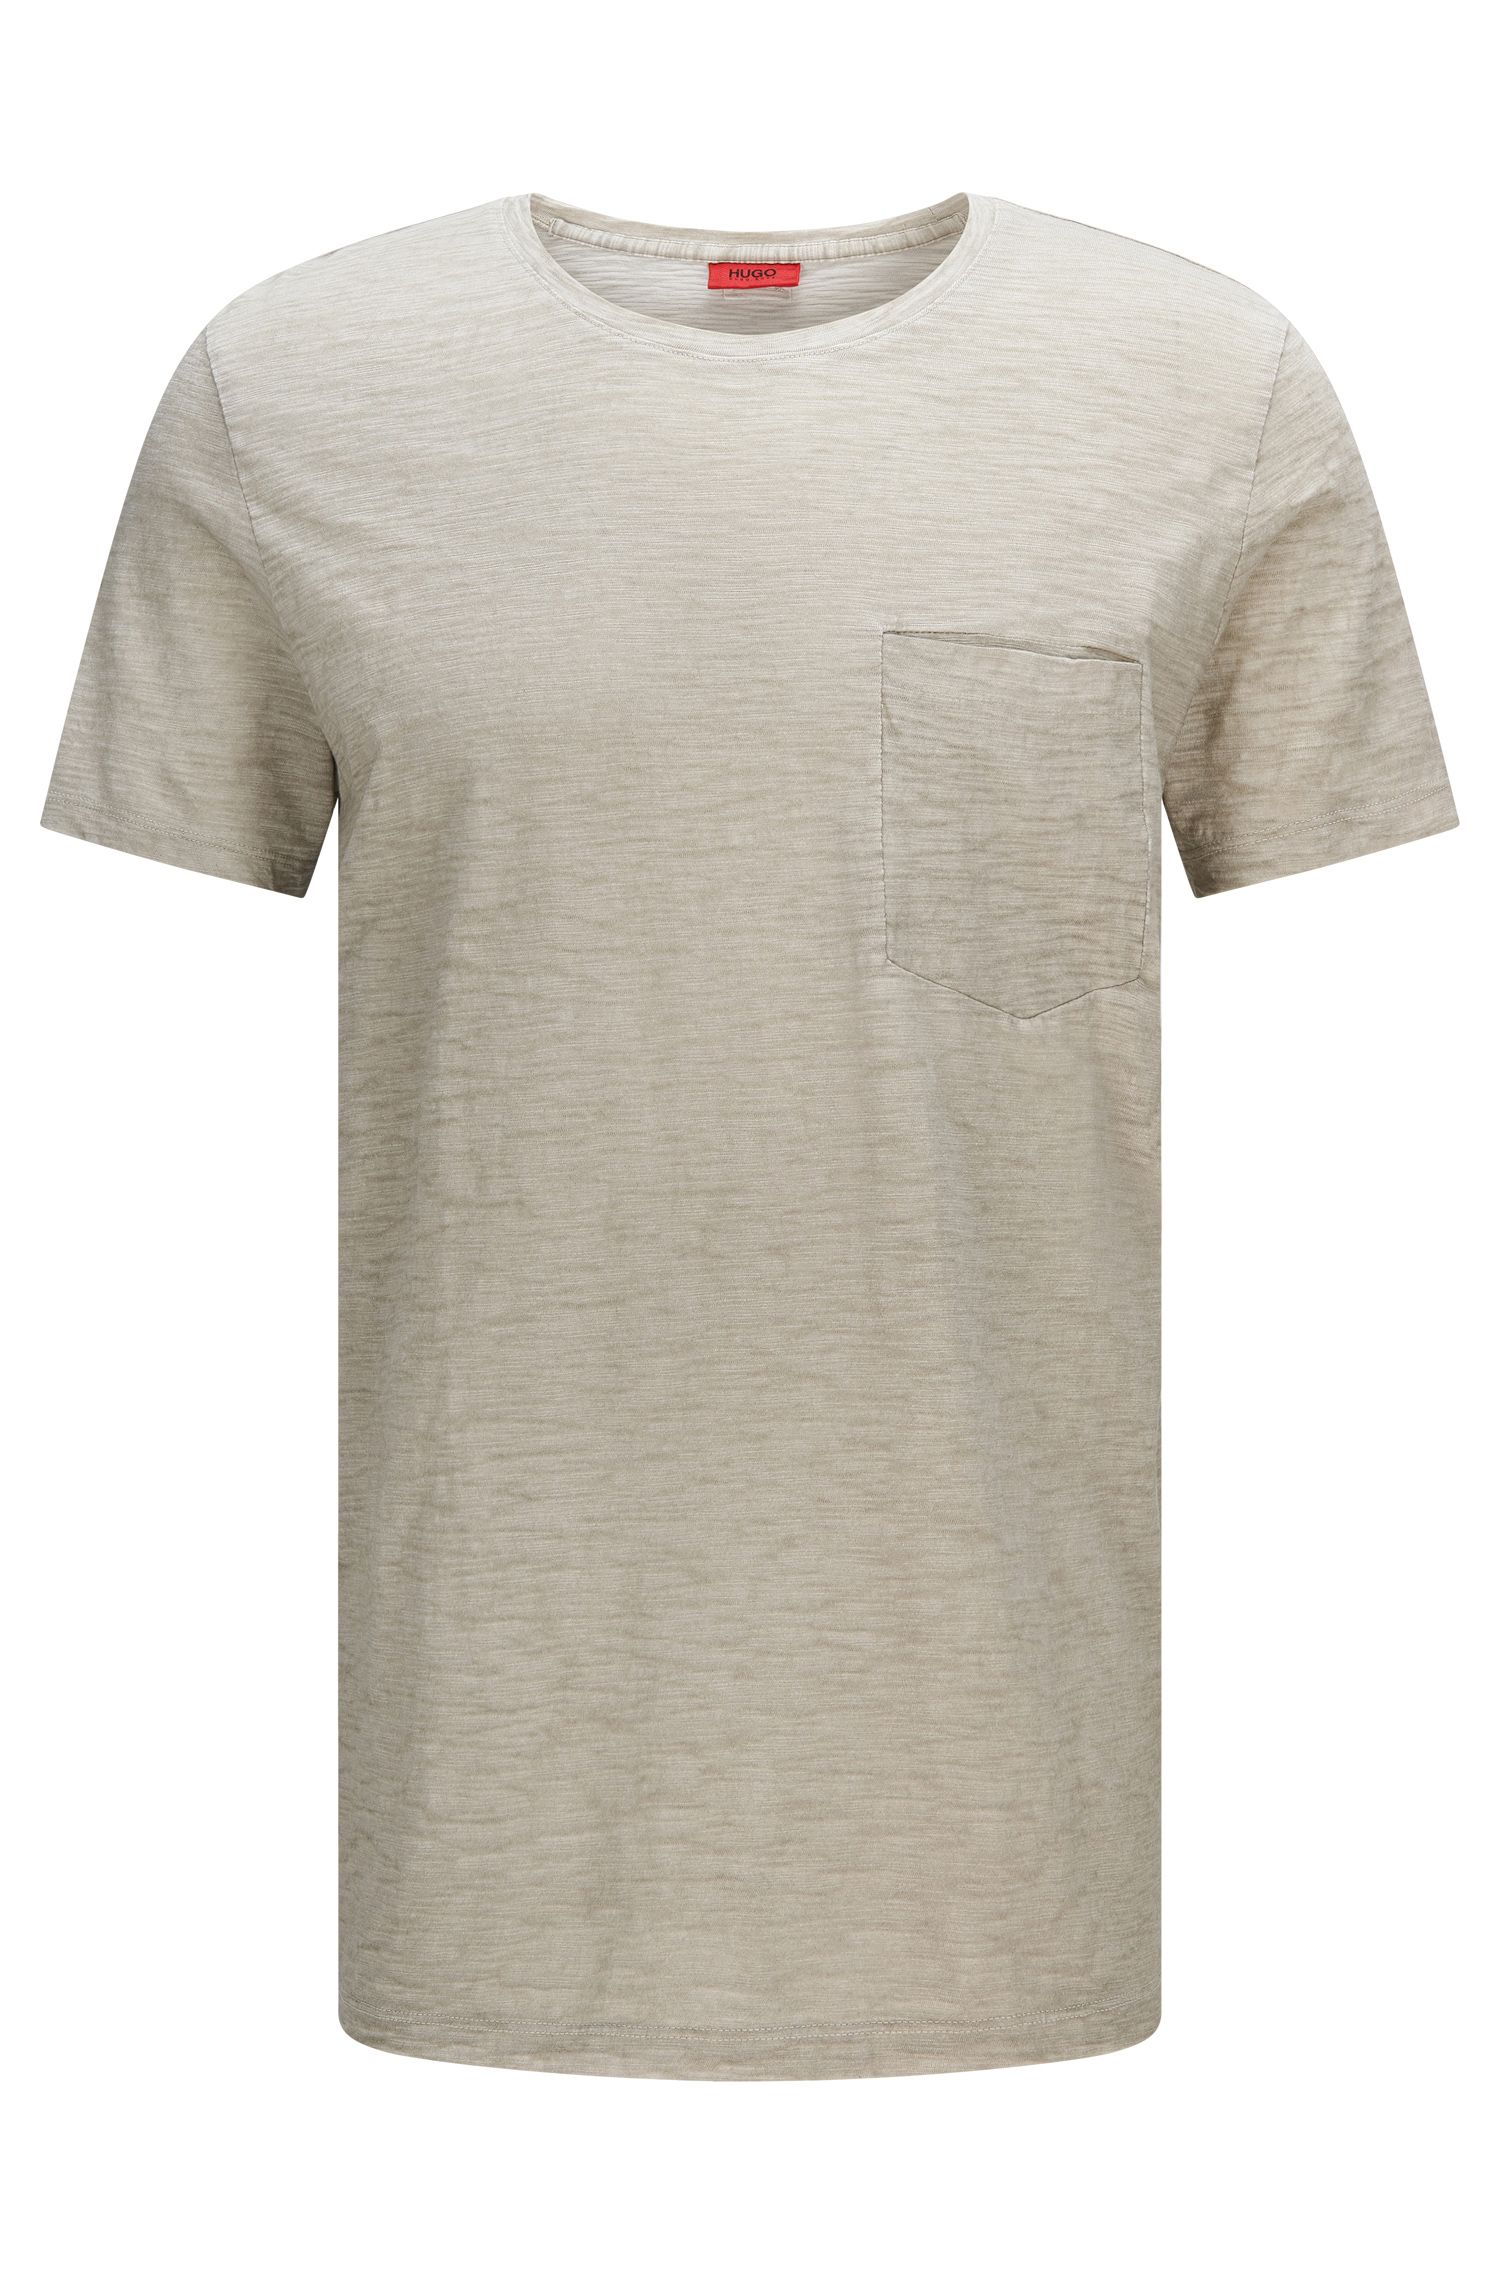 Gemêleerd, relaxed-fit T-shirt van katoen met borstzak: 'Dadobe'